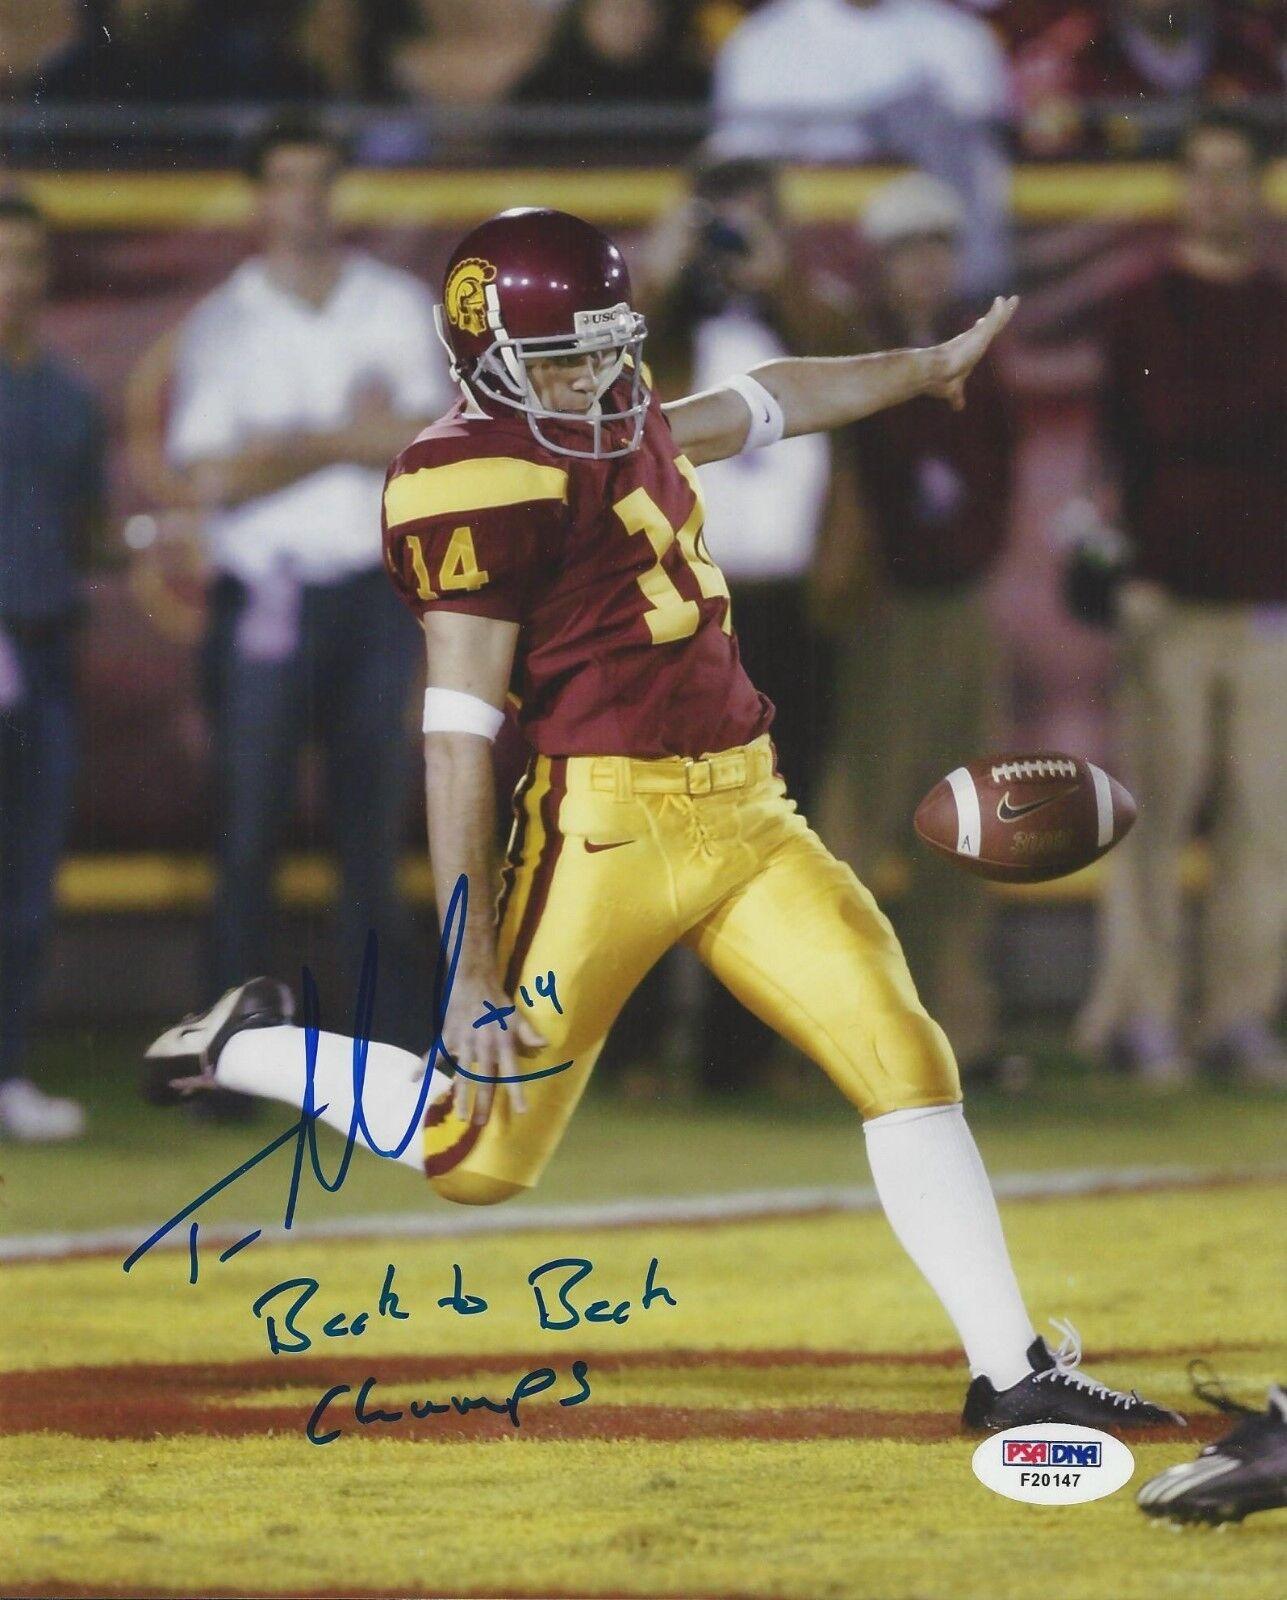 Tom Malone USC Trojans Signed 8x10 Photo PSA/DNA F20147